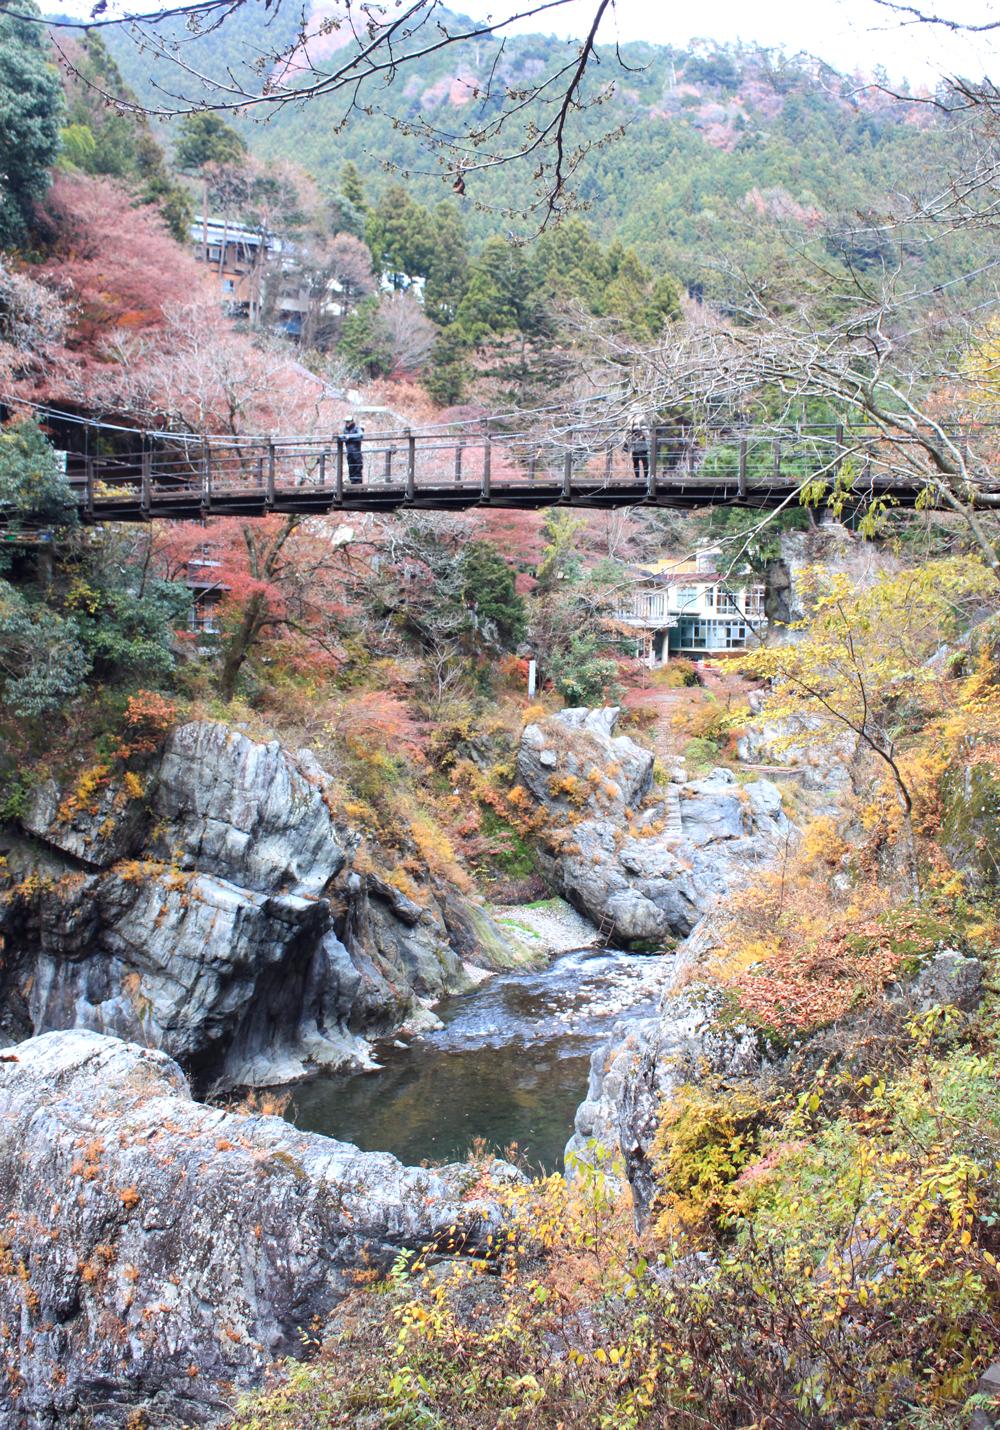 Otama walking trail, japan hiking, okutama city, kori station, tokyo, fall colors, japan nature